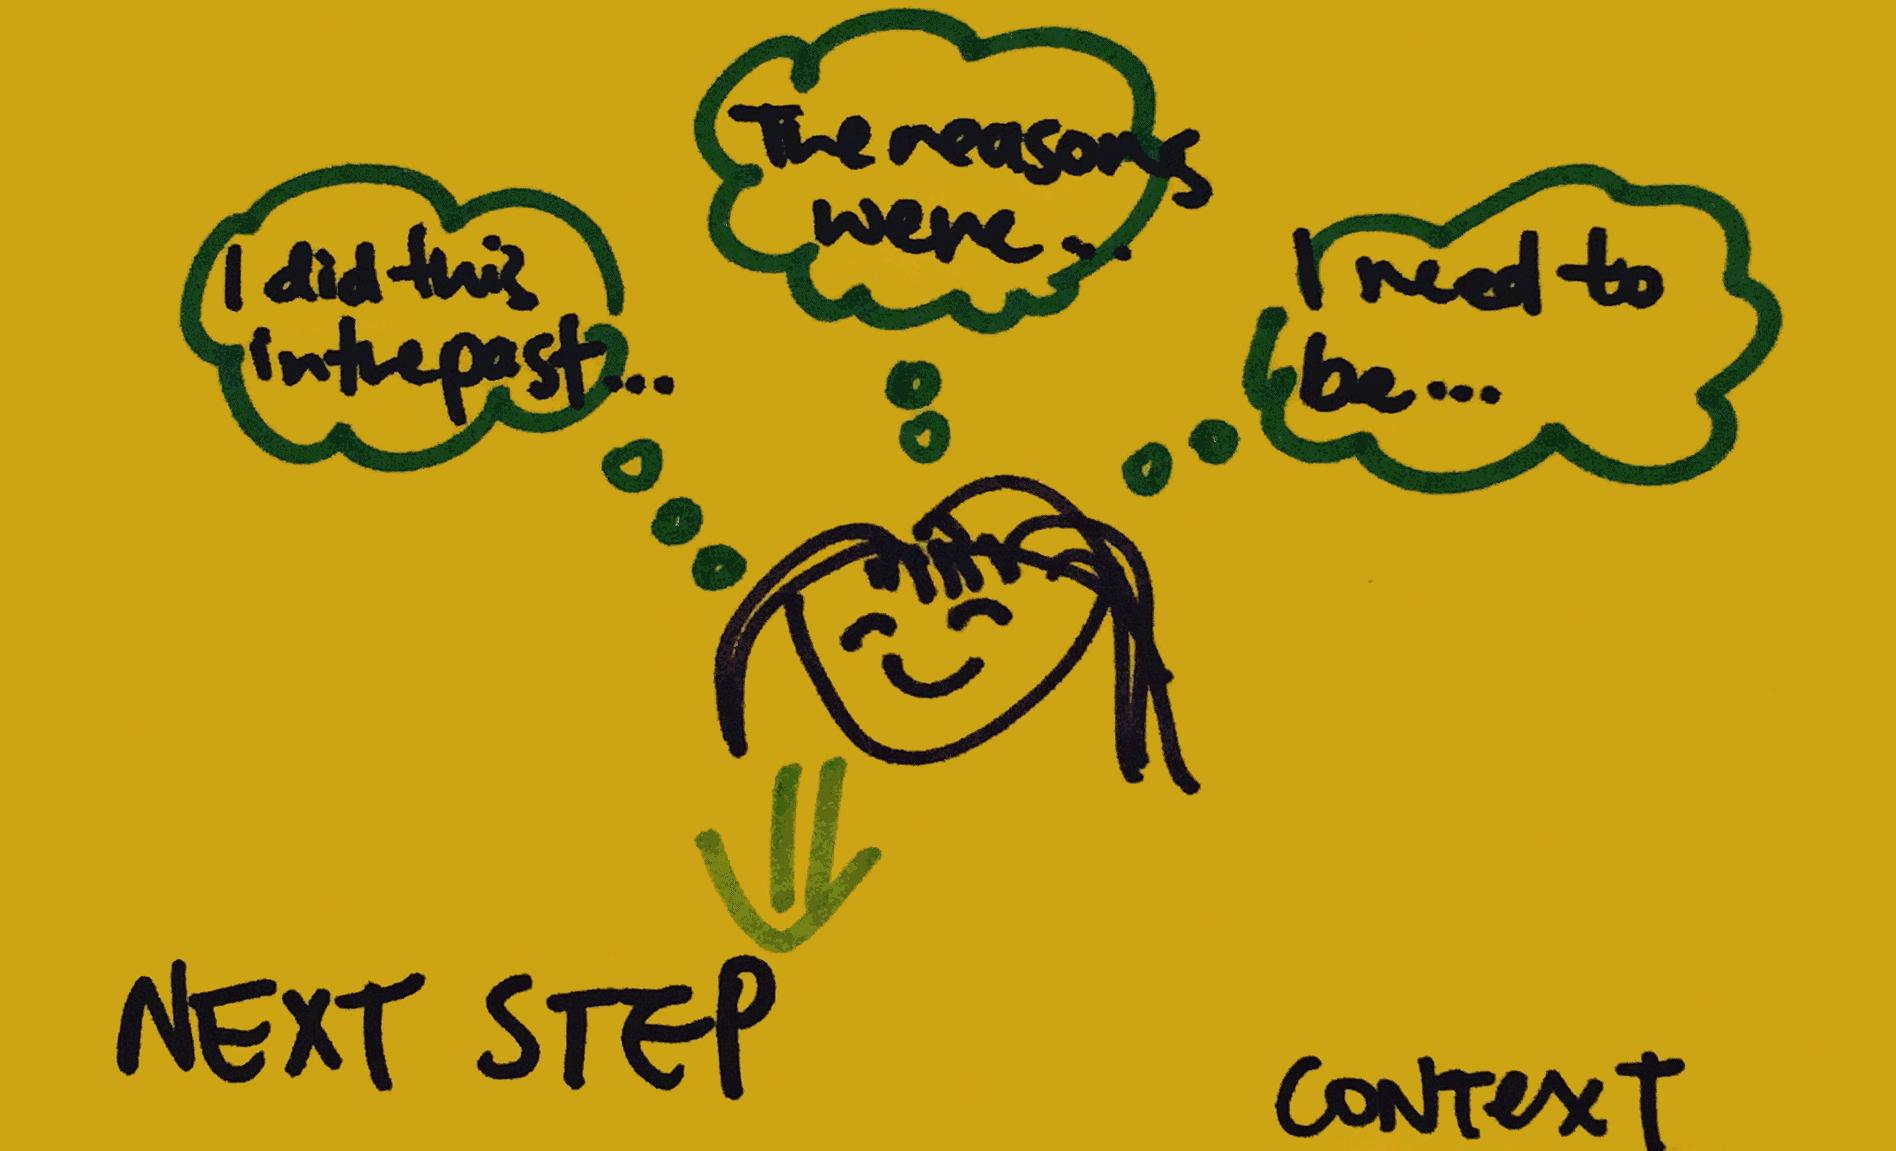 strengthsfinder-singapore-strengths-school-context-1